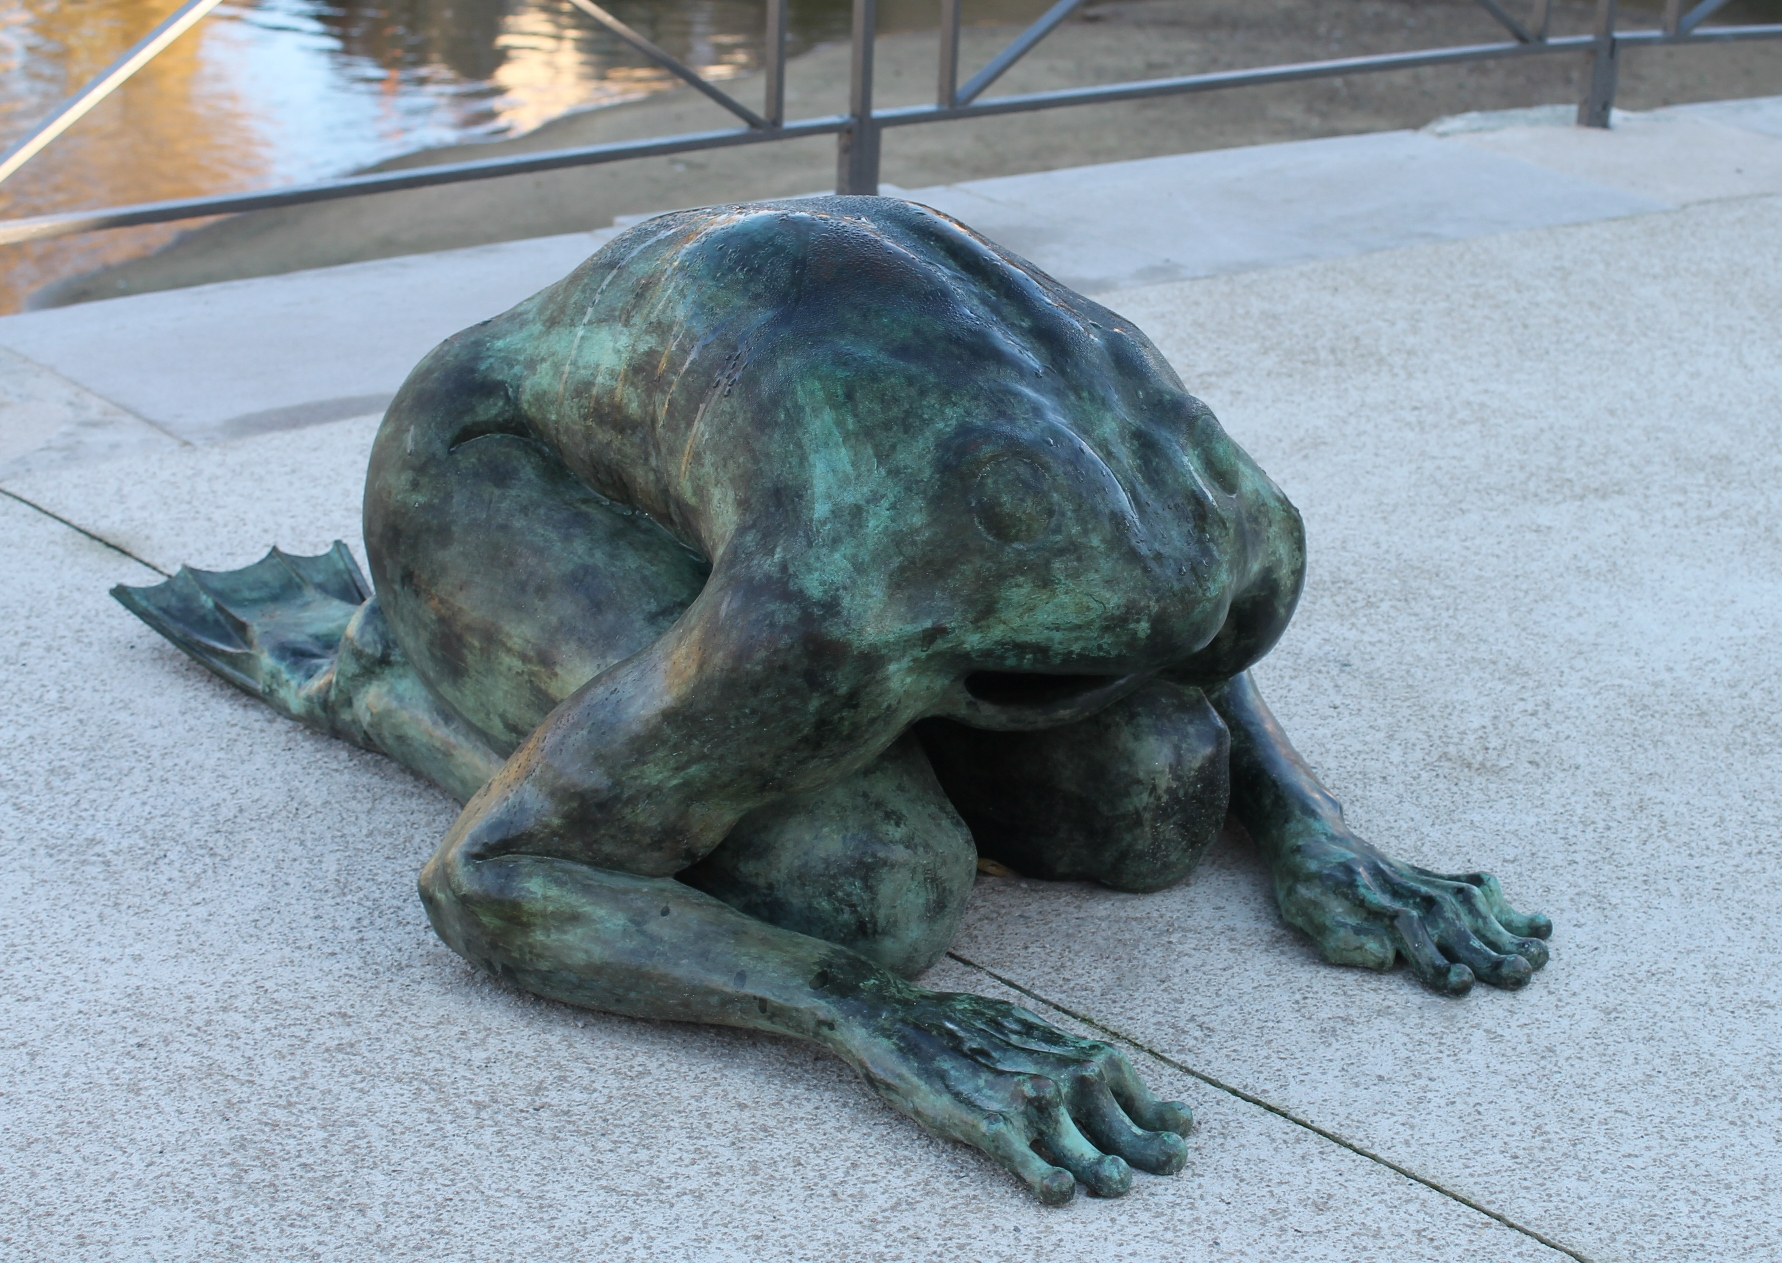 mont de marsan sculptures l animal en vecteur culturel kalakarrika